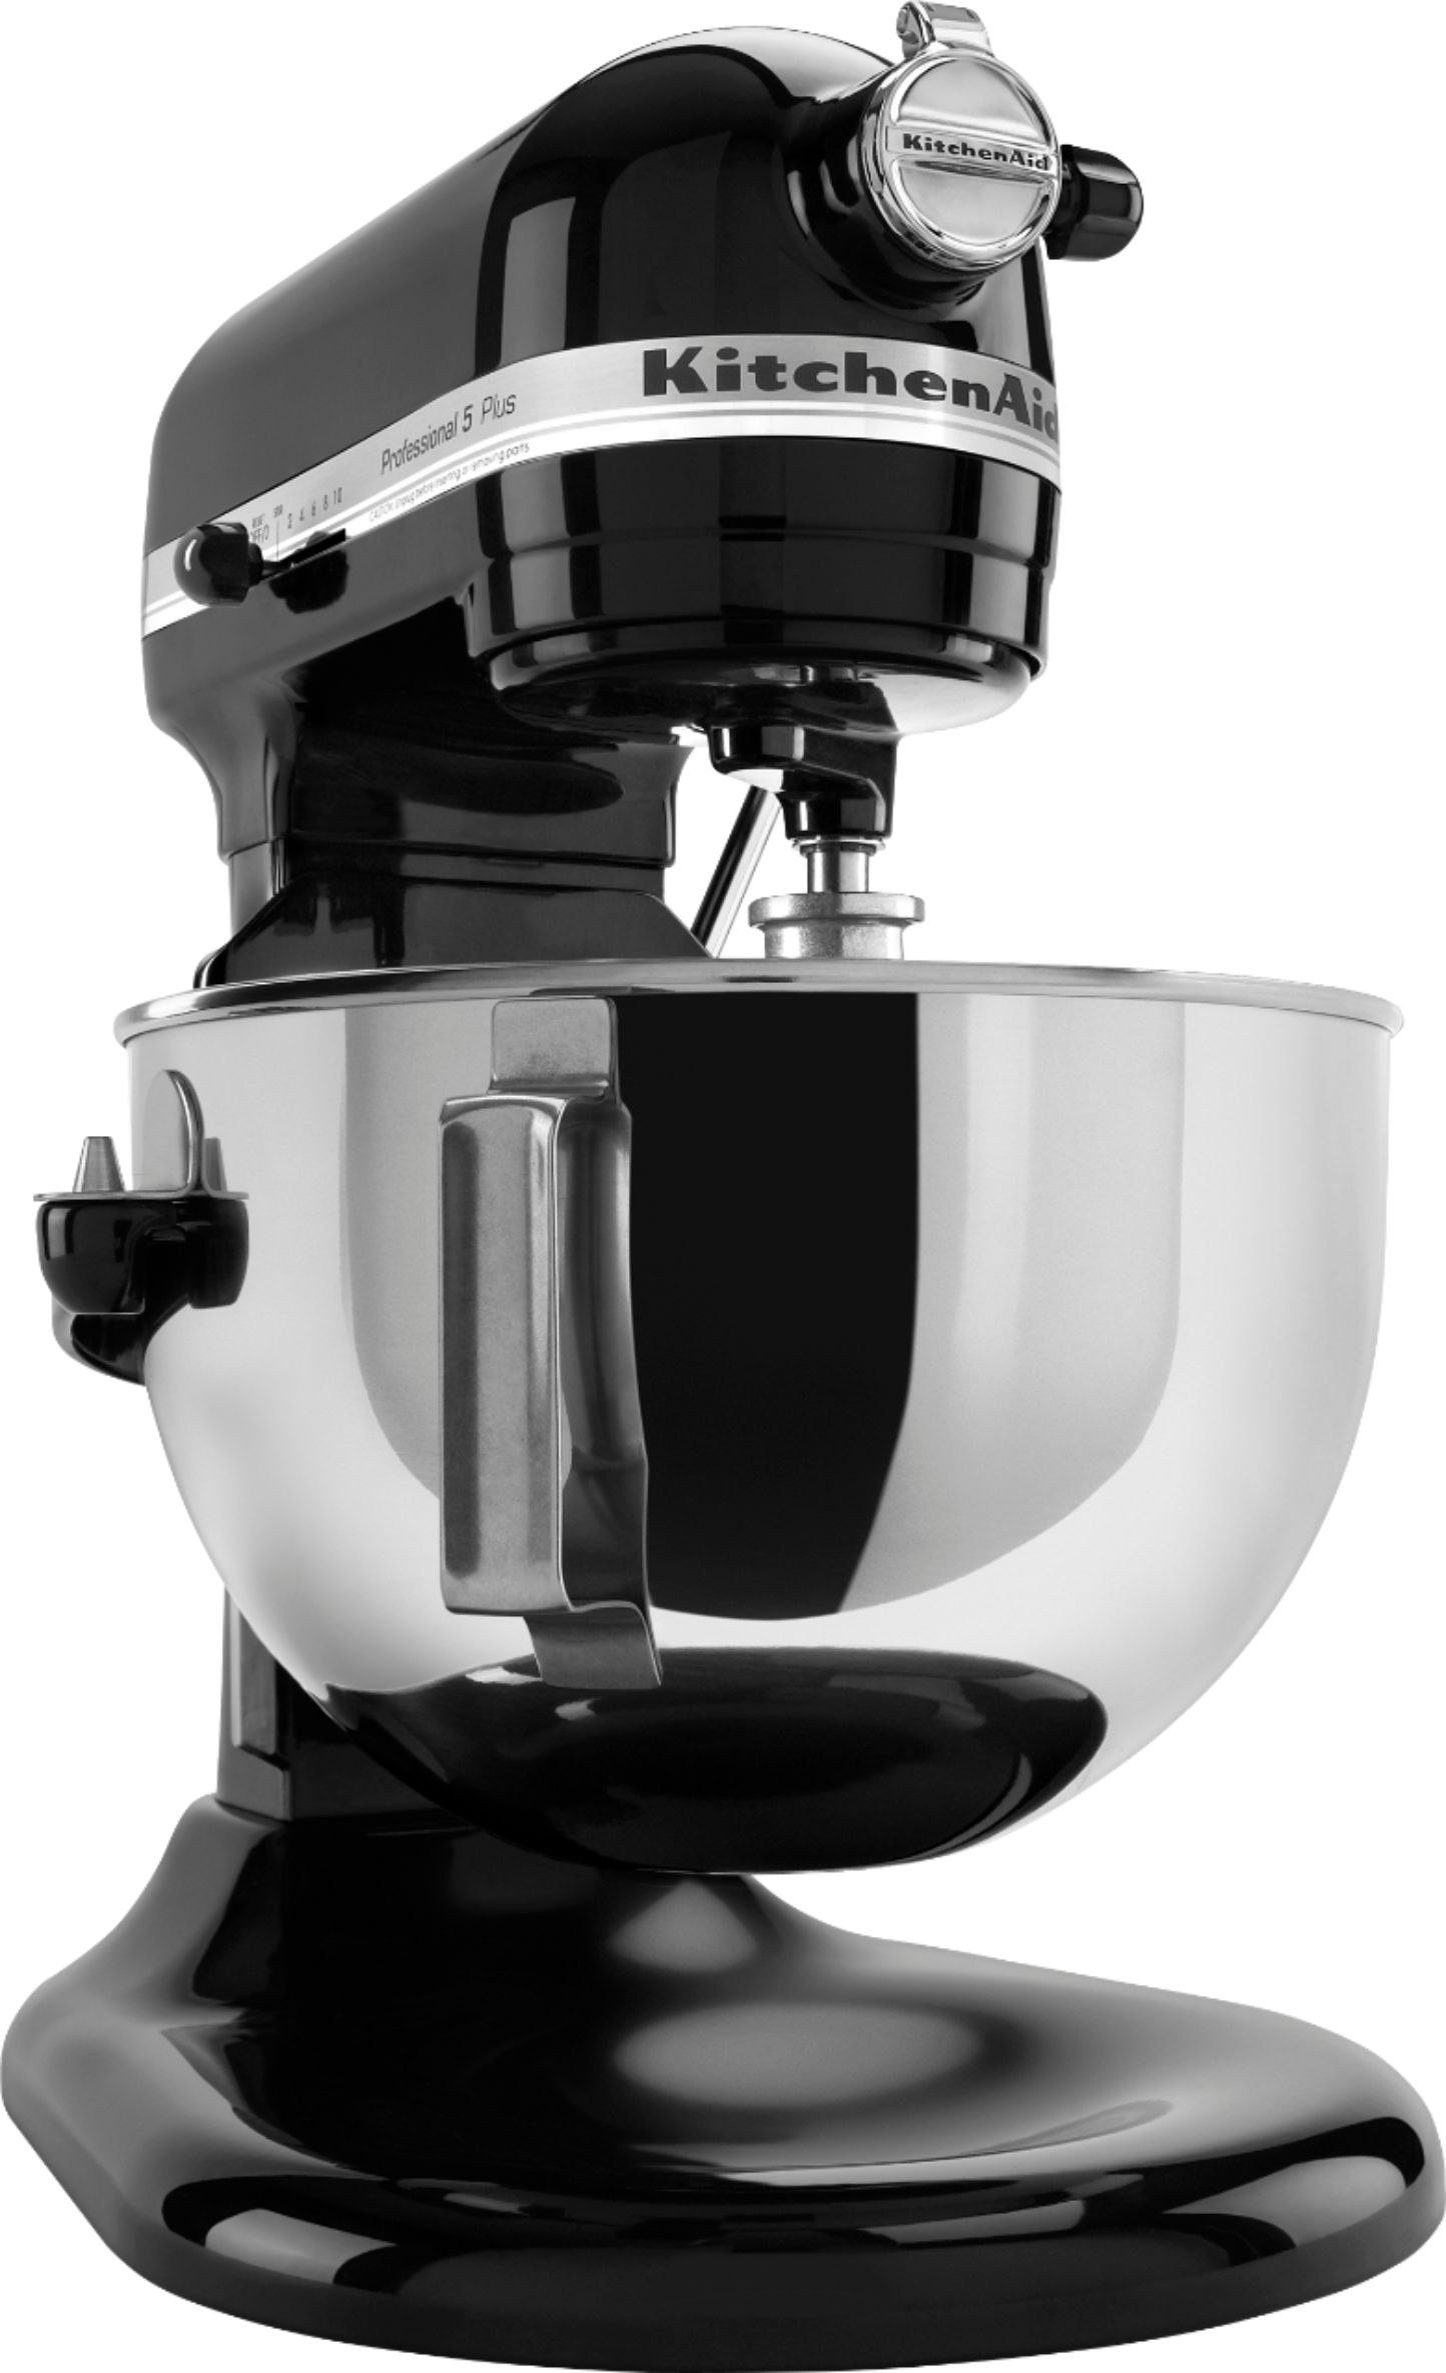 KitchenAid - Professional 5 Plus Series Stand Mixer - Onyx Black - Angle Zoom